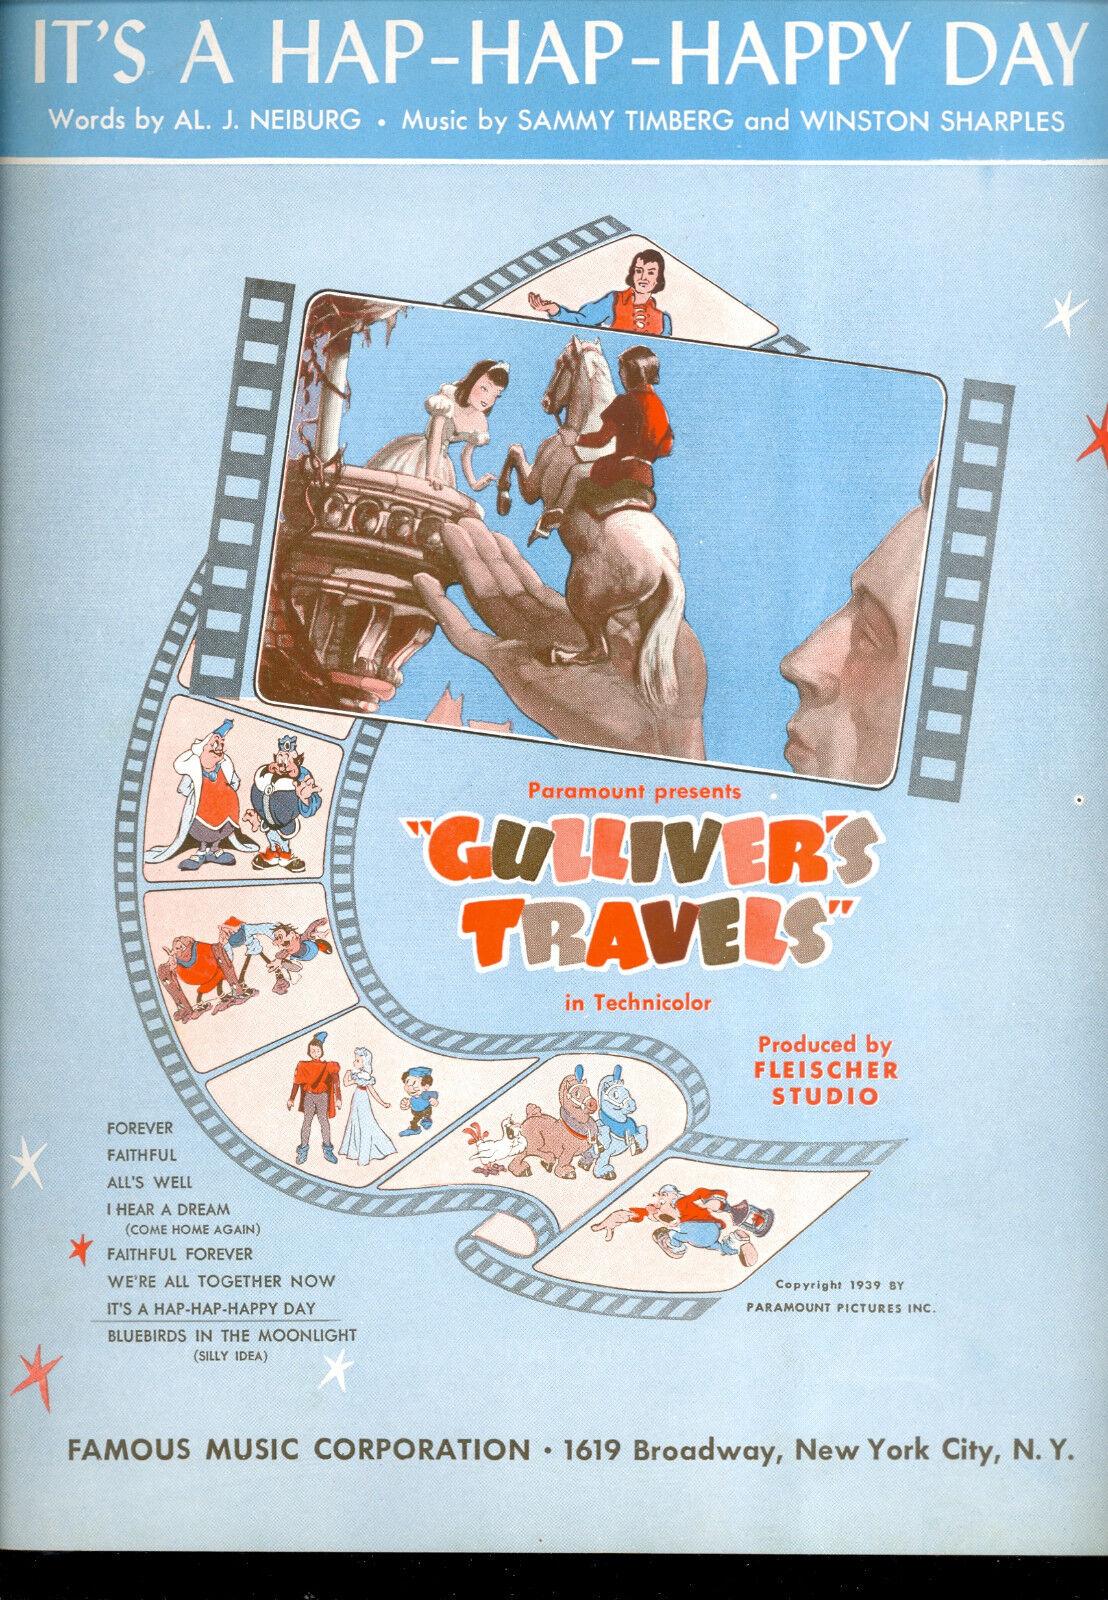 GULLIVER'S TRAVELS Notenblatt   It's A Hap-Hap-Happy Tag   Max Fleischer Cartoon